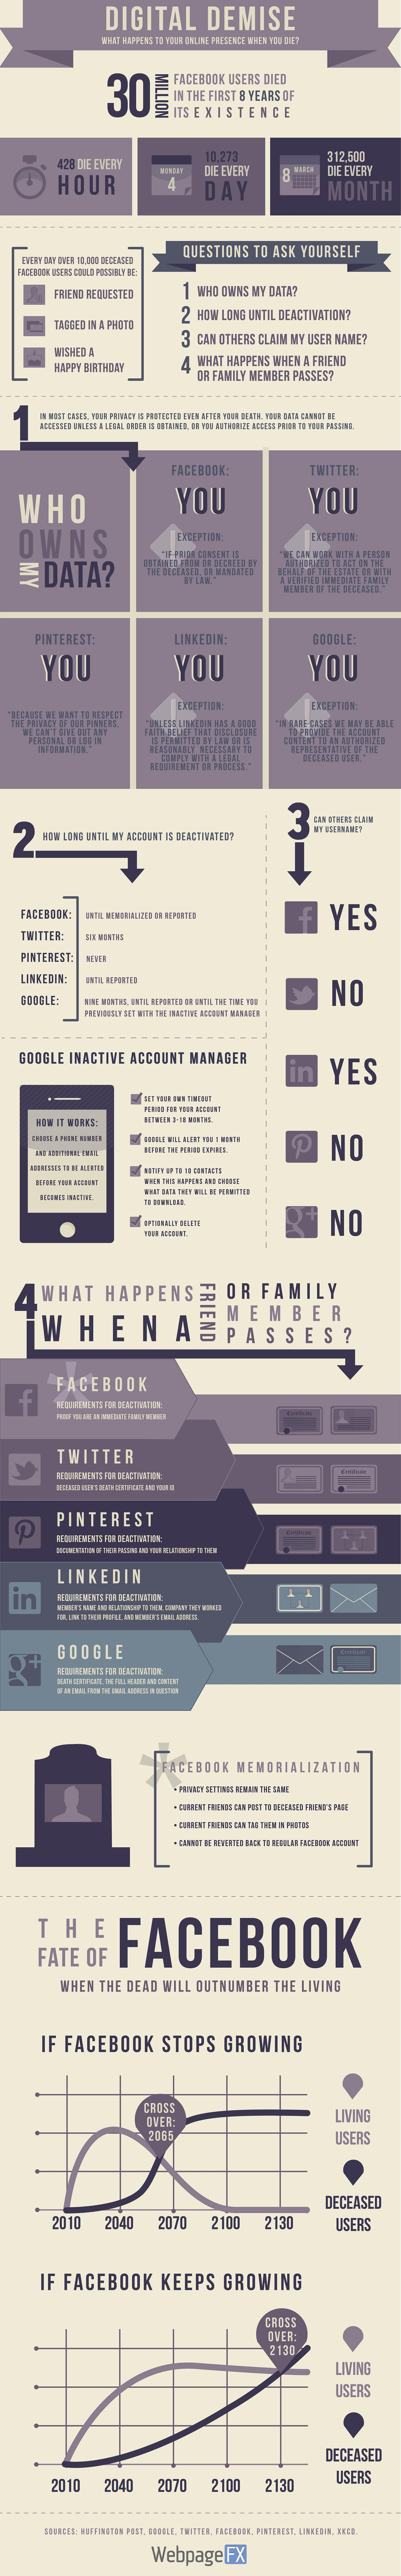 Digital-Demise-Infographic